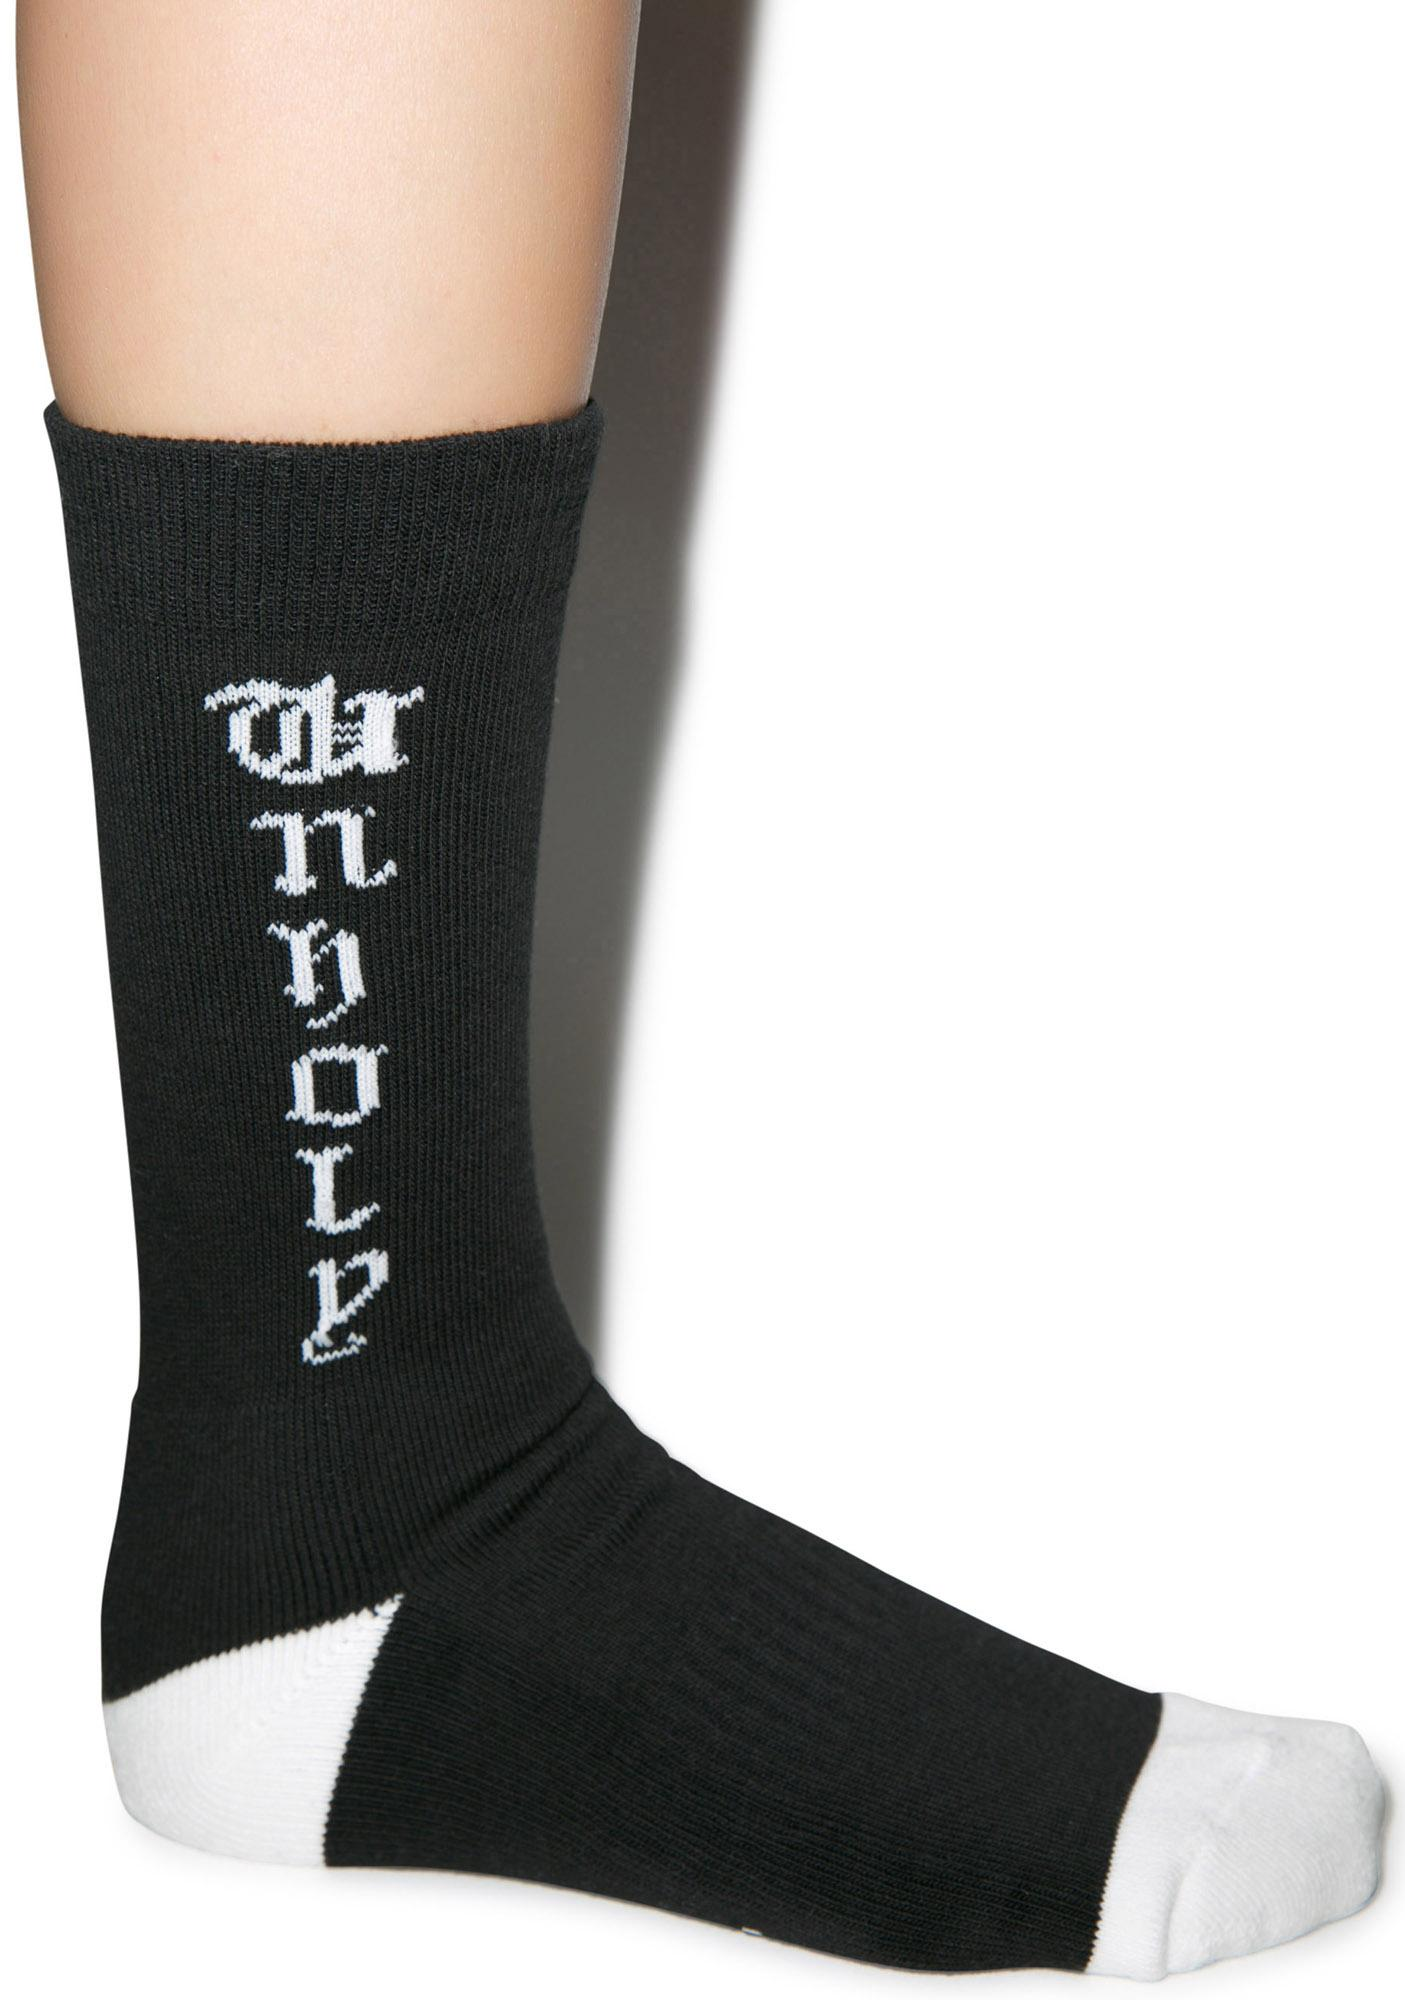 Unholy Socks